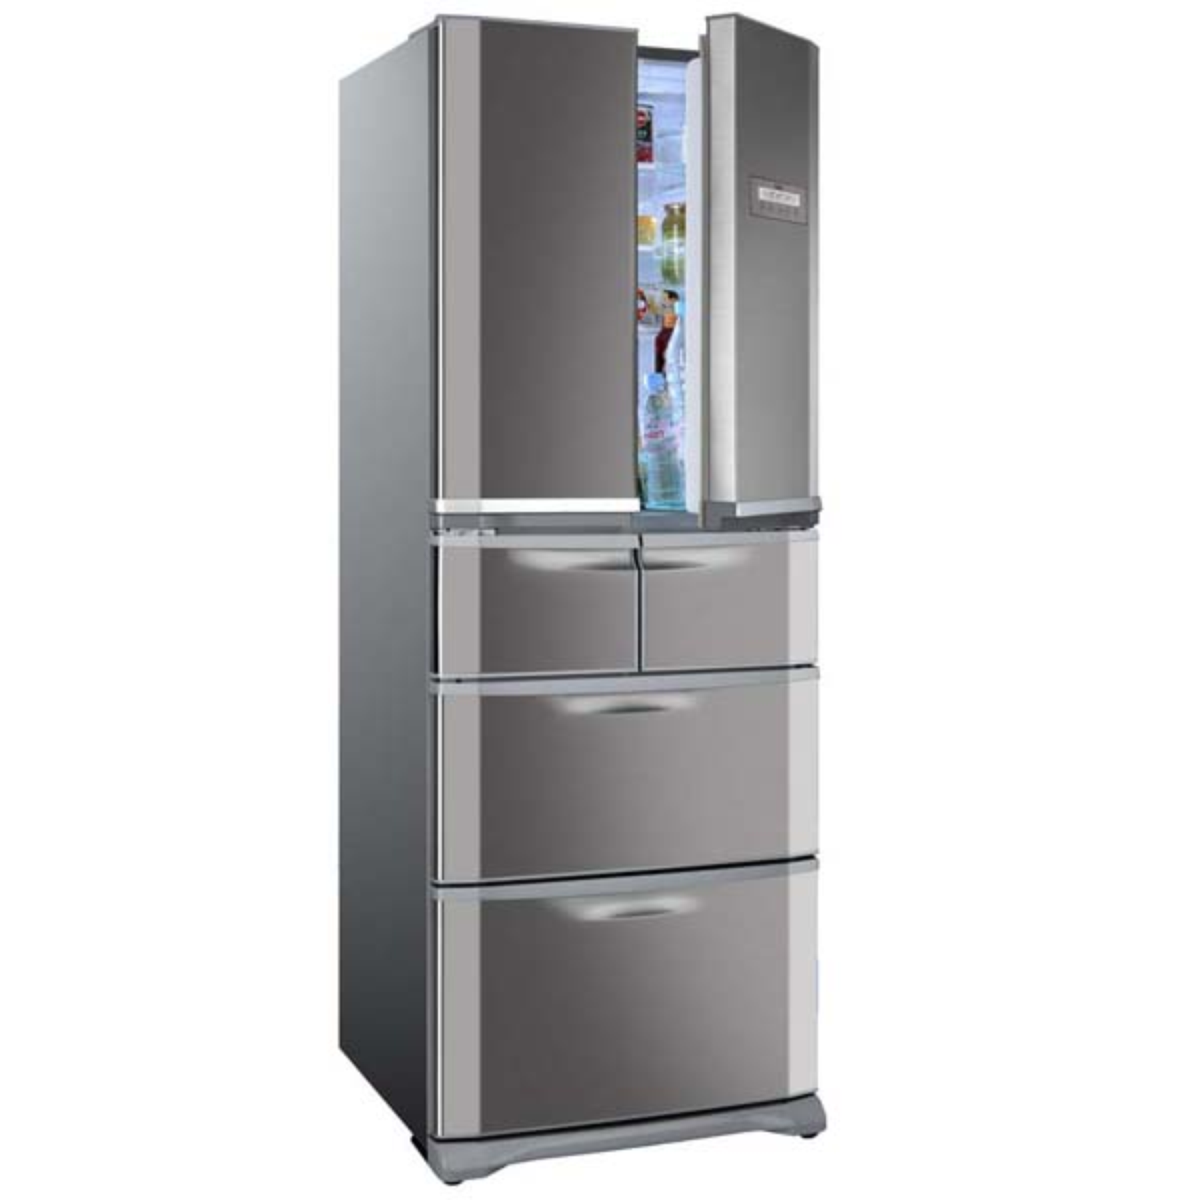 海尔冰箱 bcd-331w